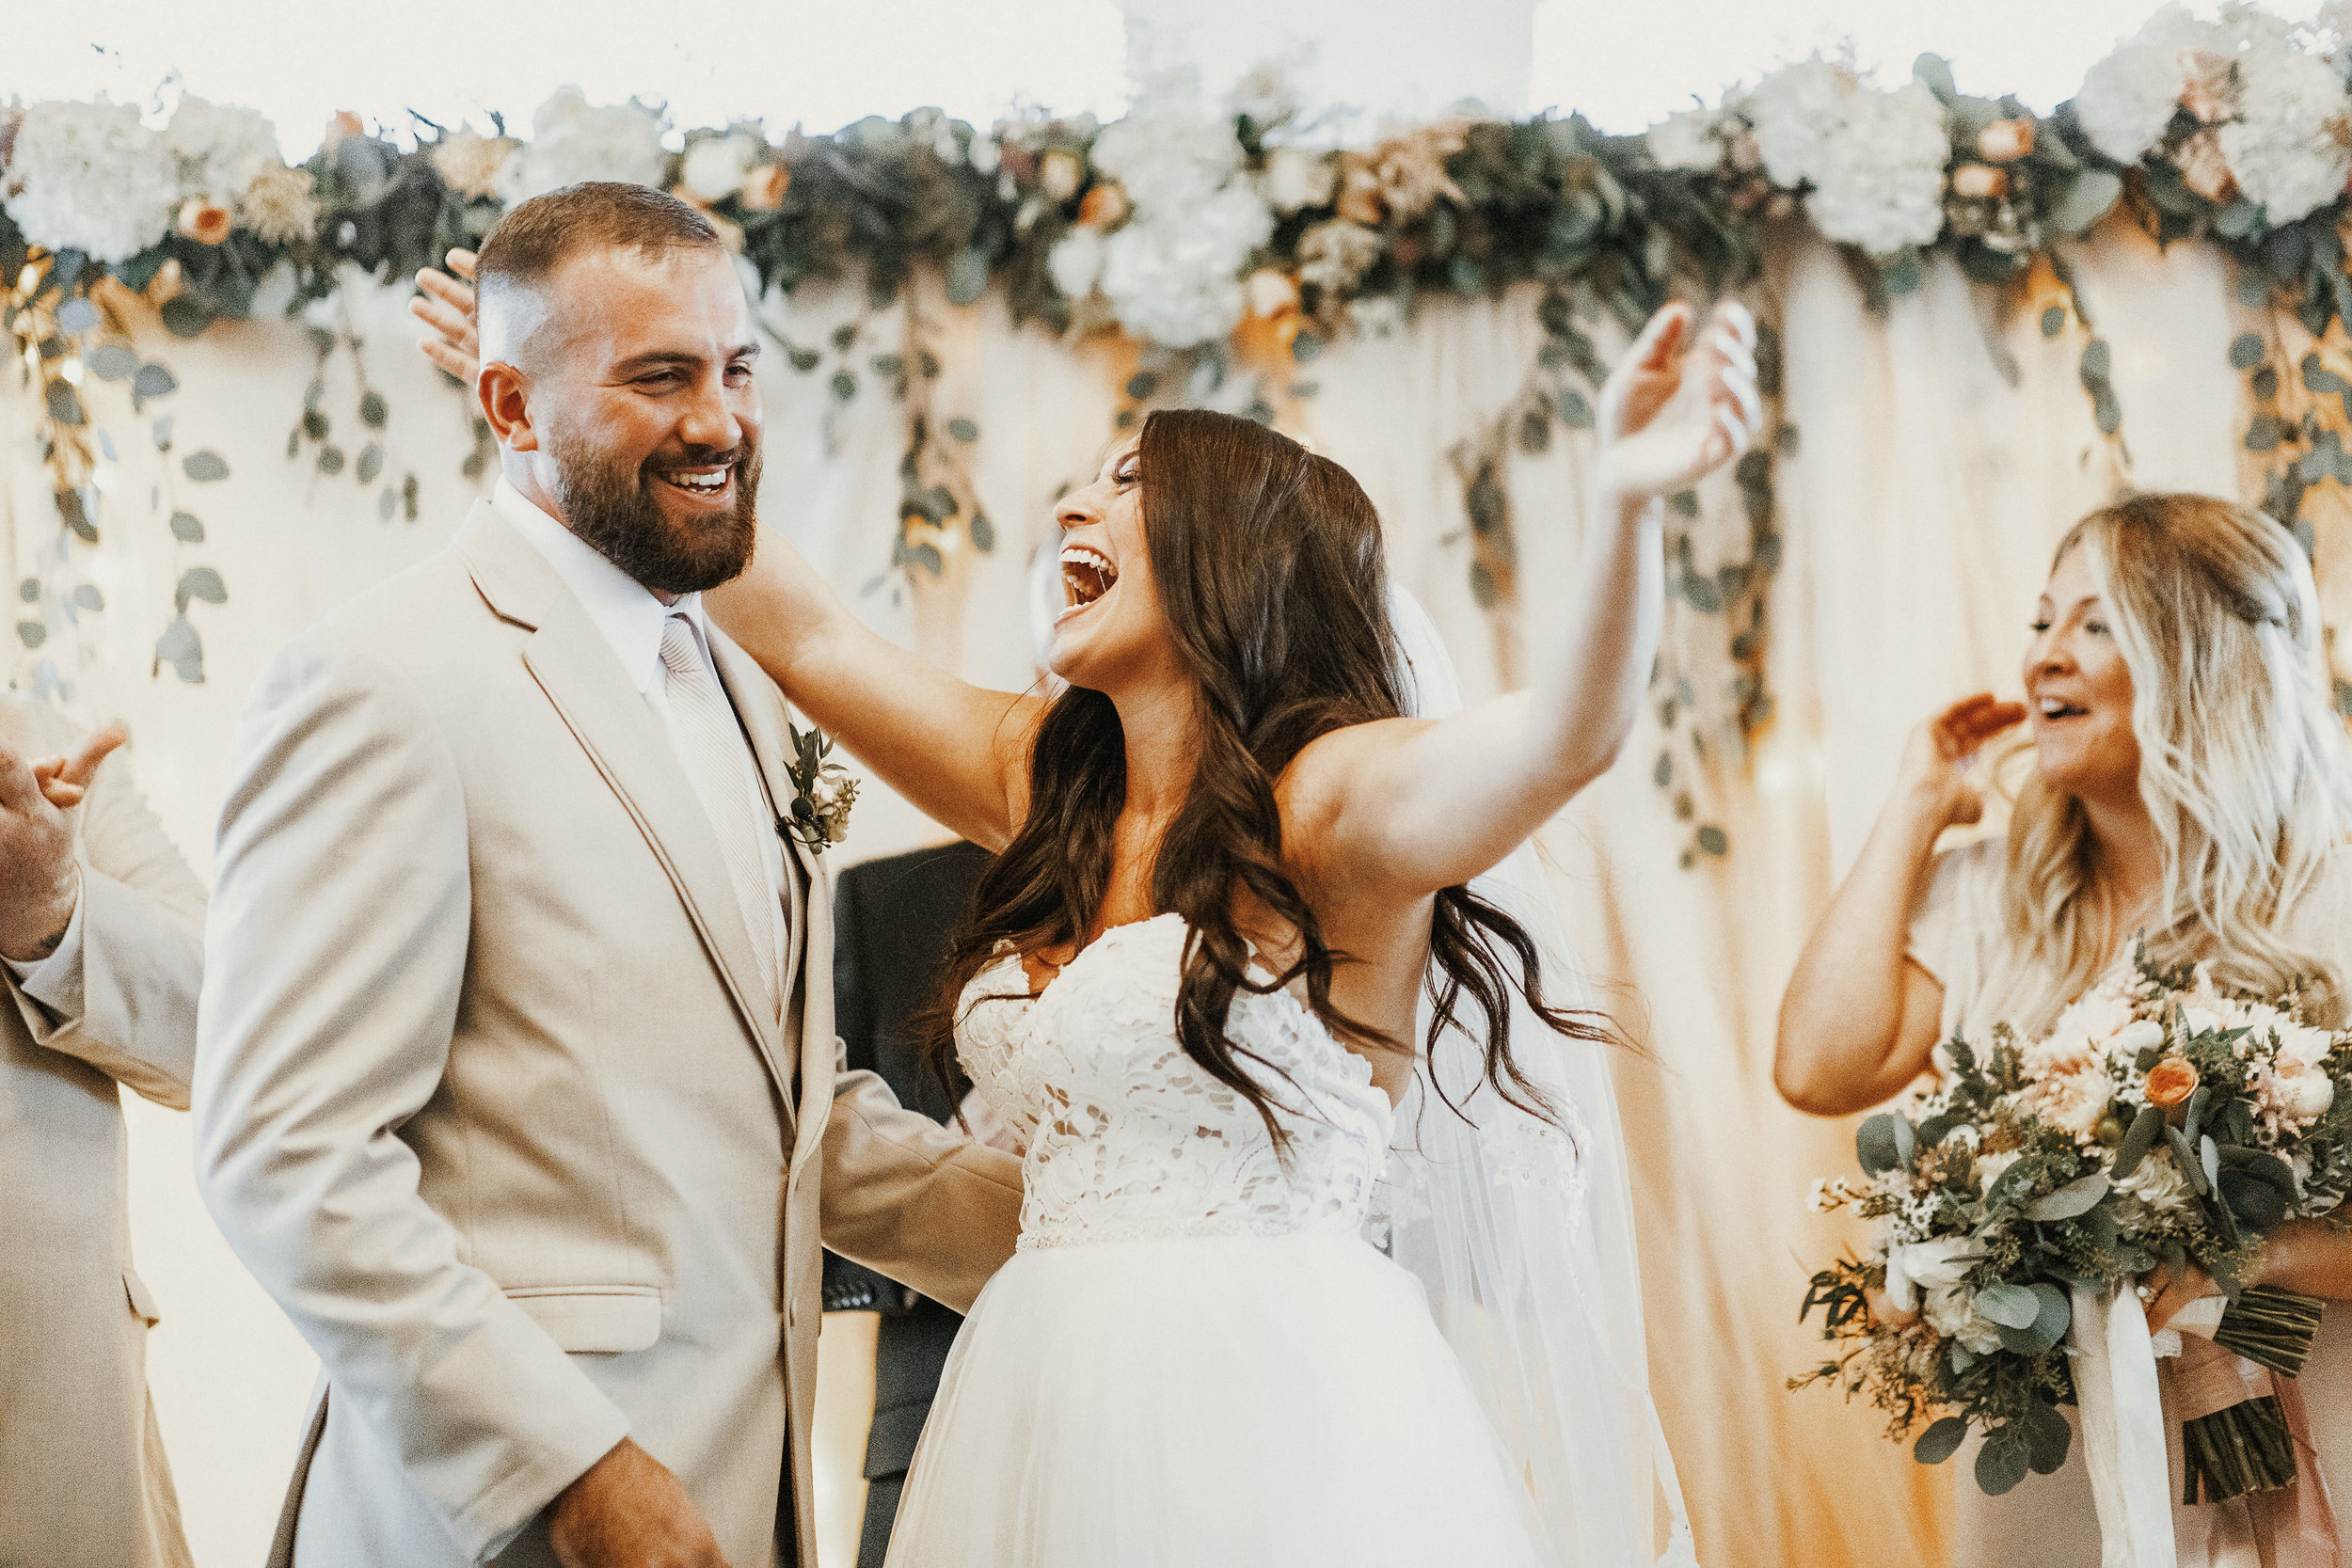 Our Wedding Photos | Pine Barren Beauty | wedding photo inspiration, wedding ceremony photos